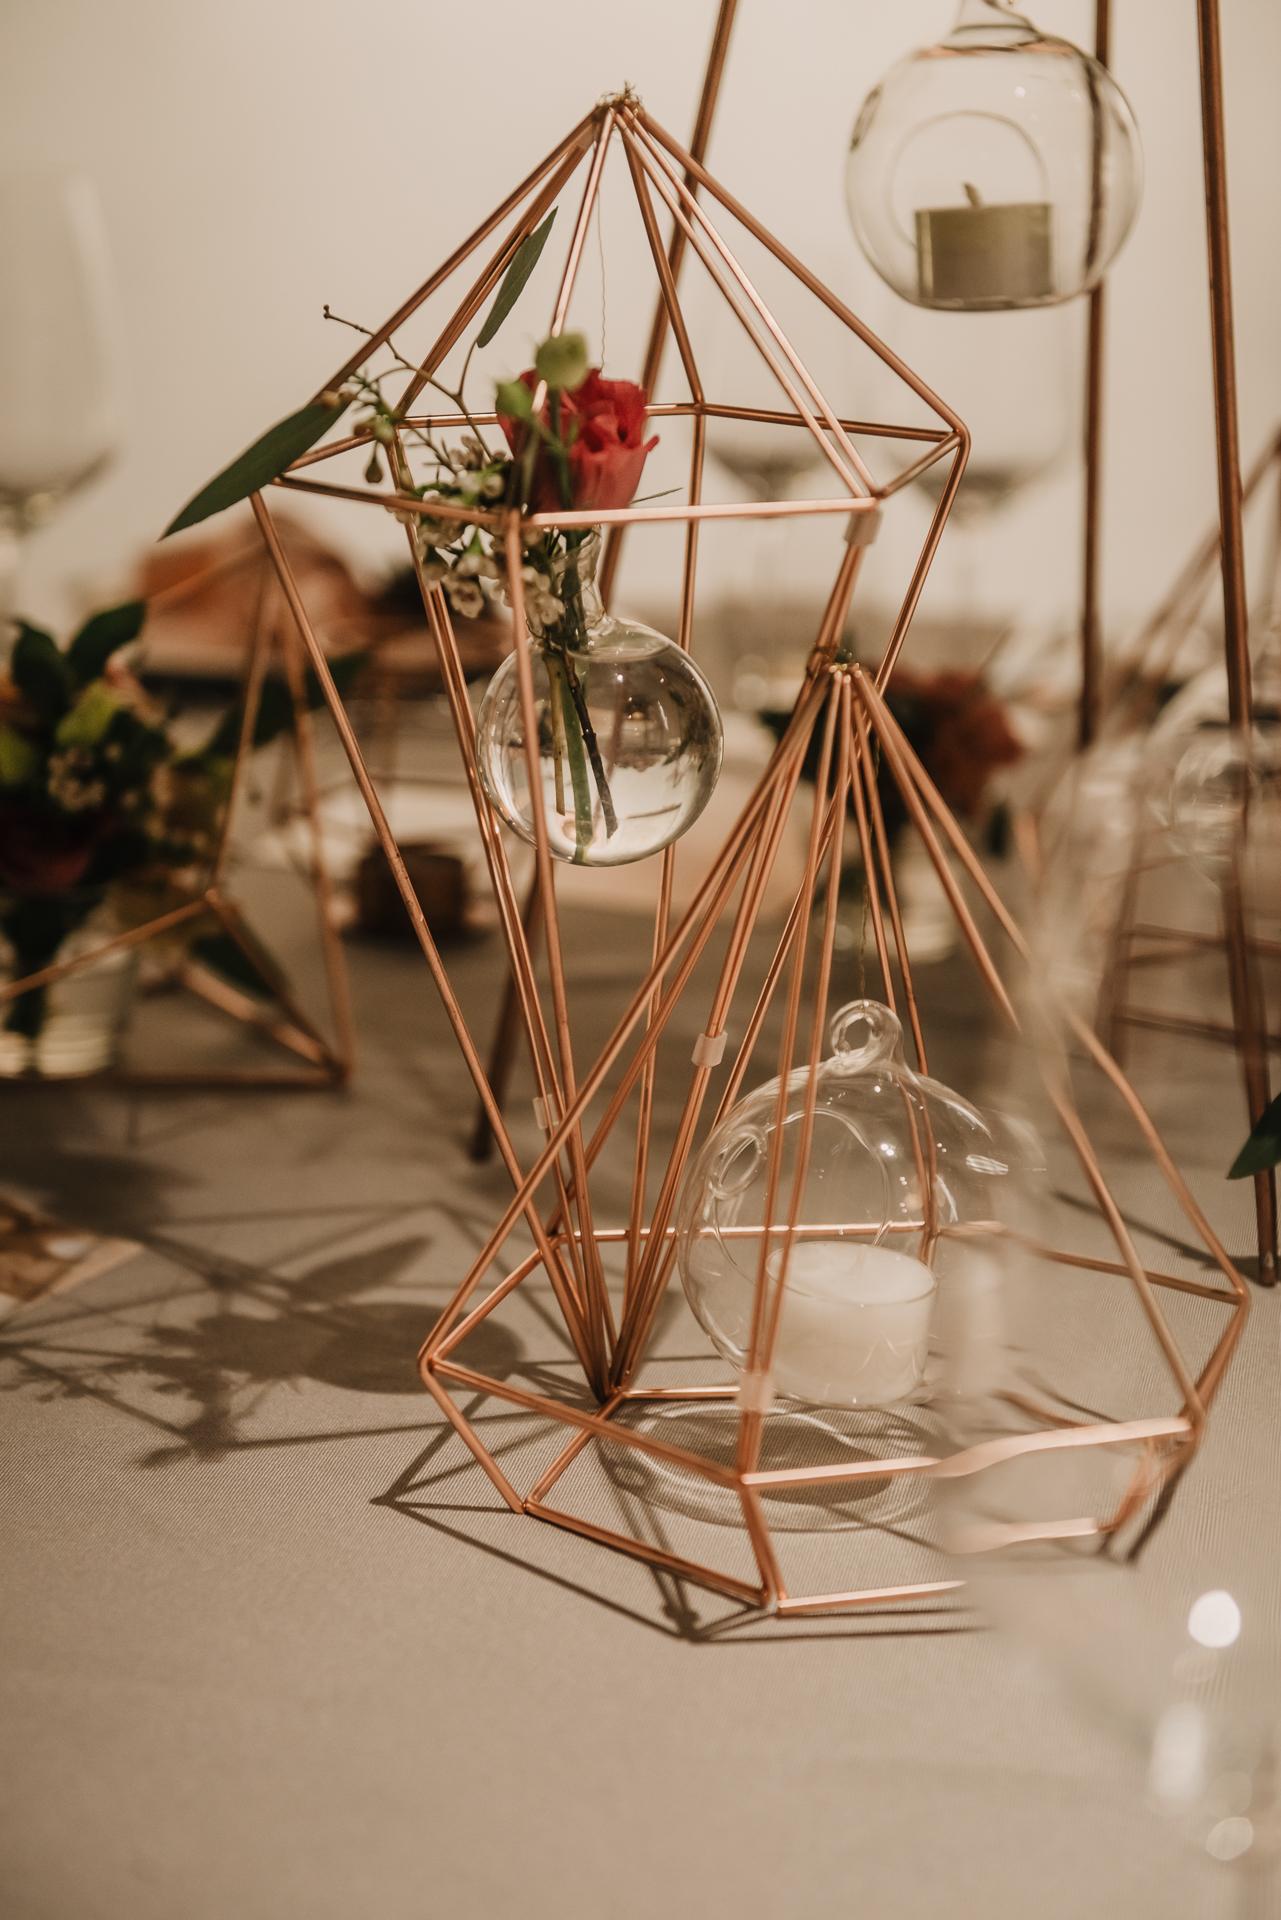 Zweinander-LeonoreHerzog-WeddingMarket-OnTour20191110-9694